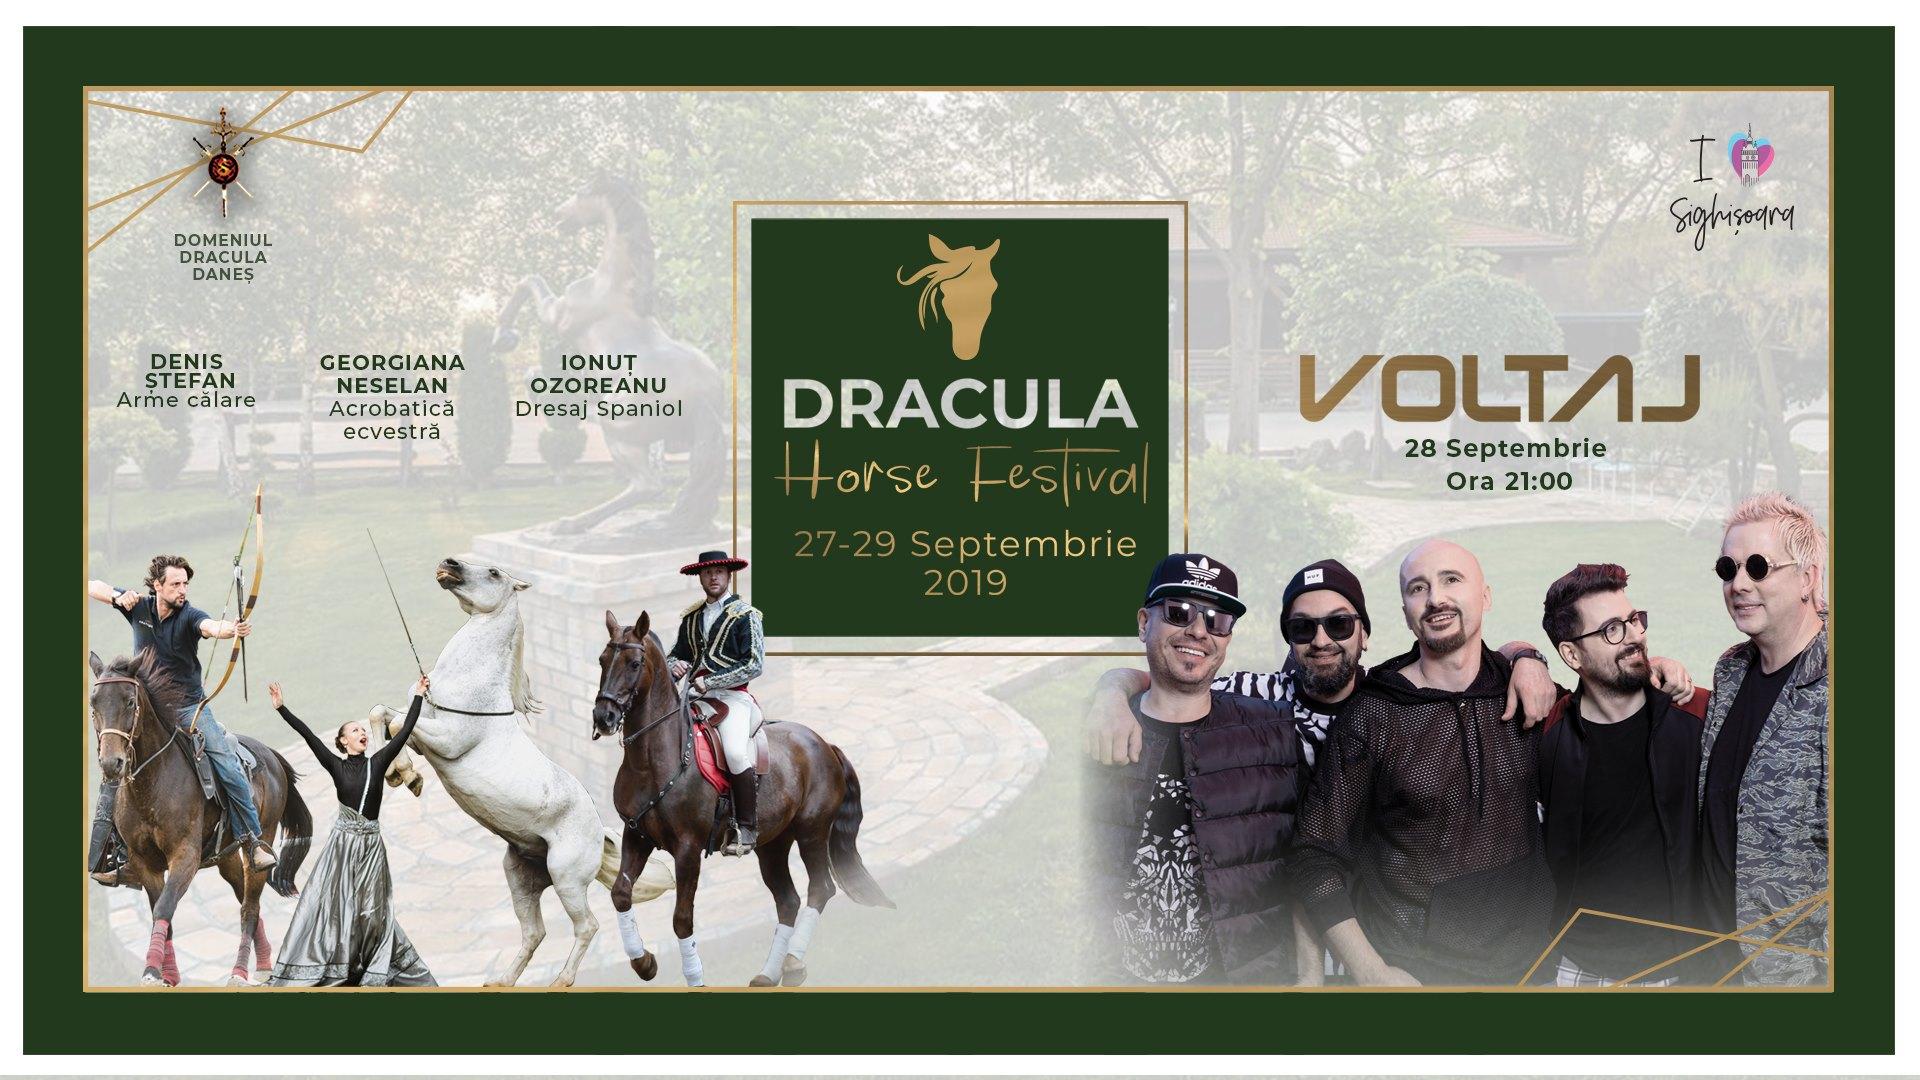 Dracula Horse Festival 2019